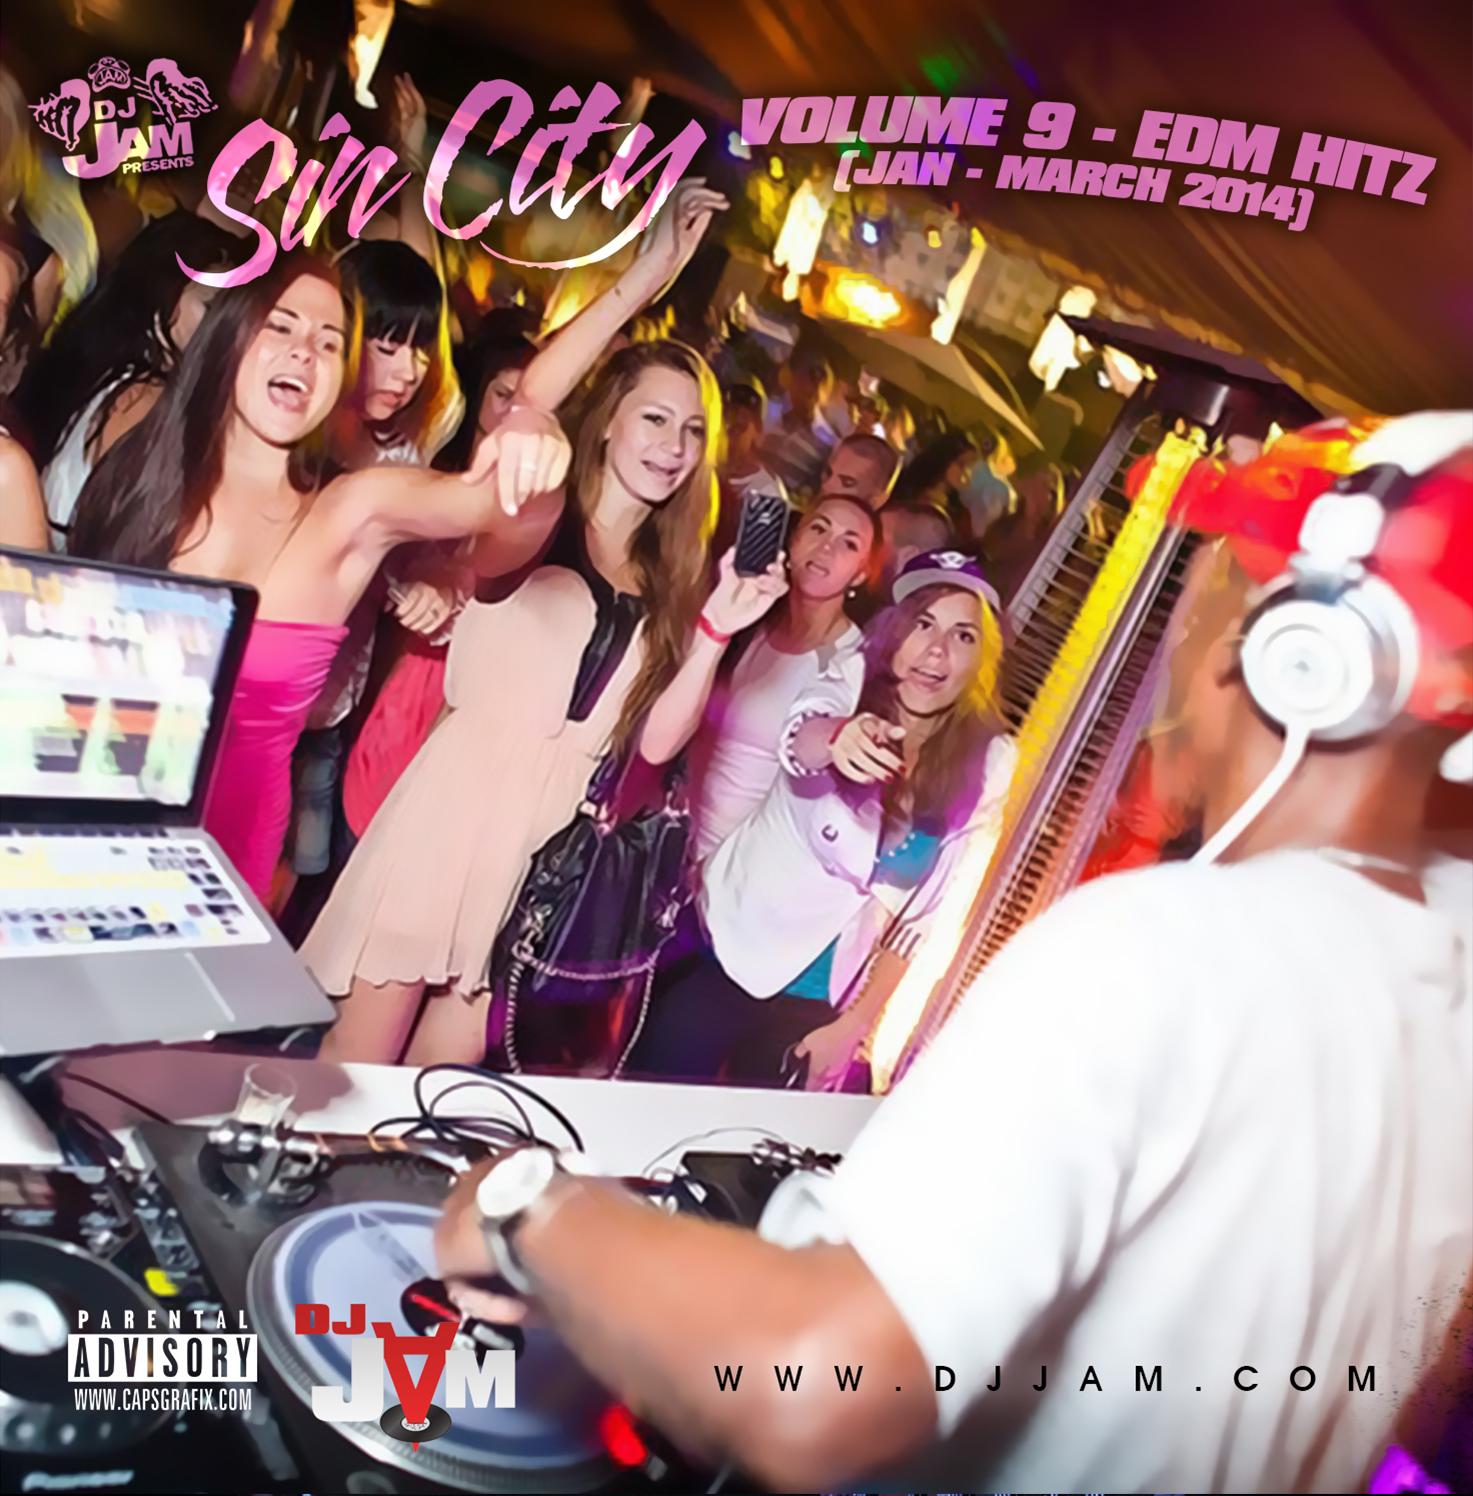 """NEW MUSIC"" SIN CITY VOL. 9 EDM vs HIP-HOP/RnB/POP (JAN - MARCH 2014)"